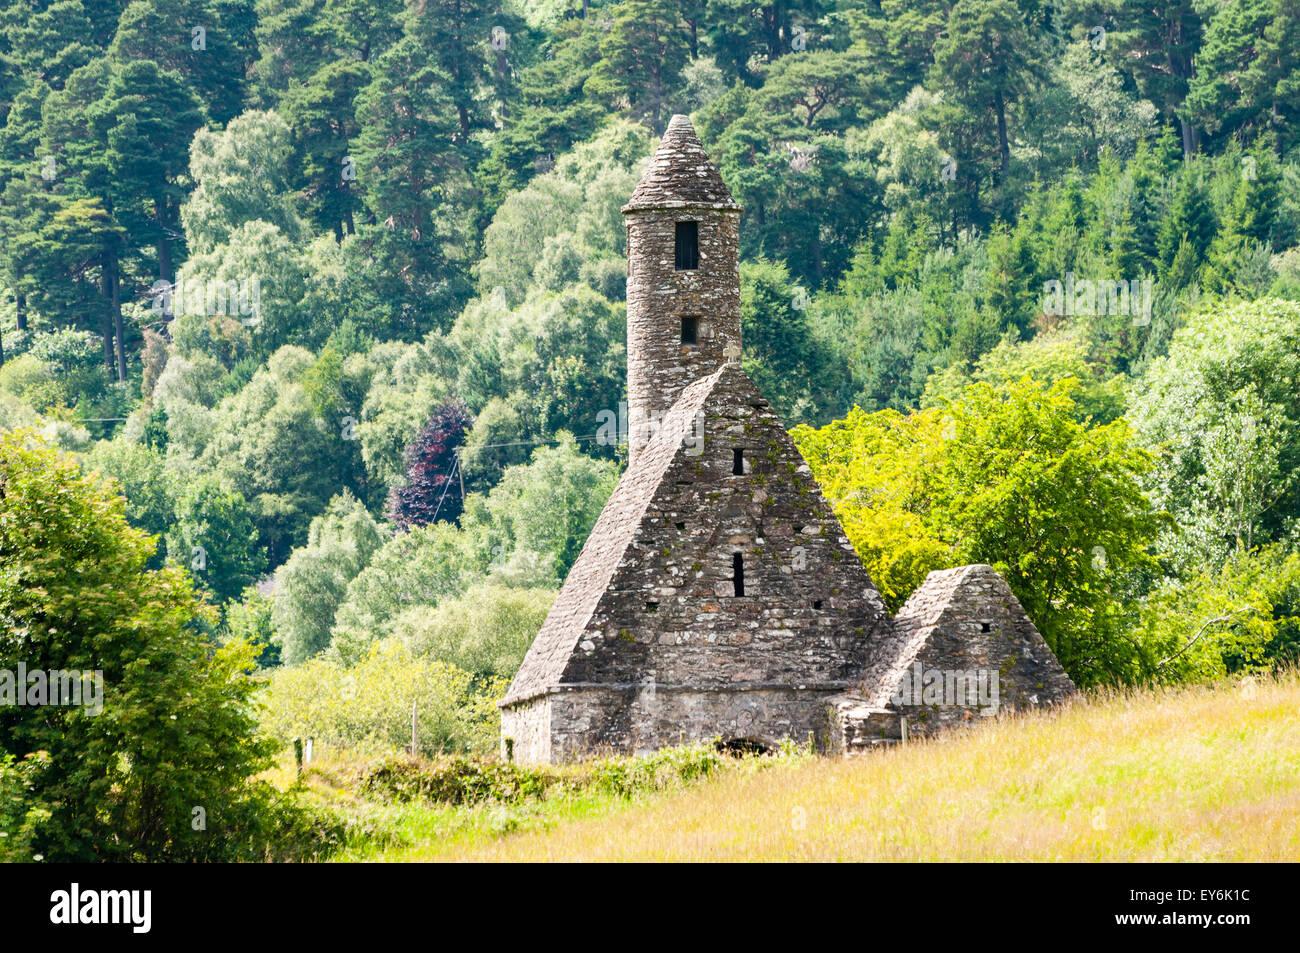 6th Century Monastic church at Glendalough, Wicklow, Ireland - Stock Image